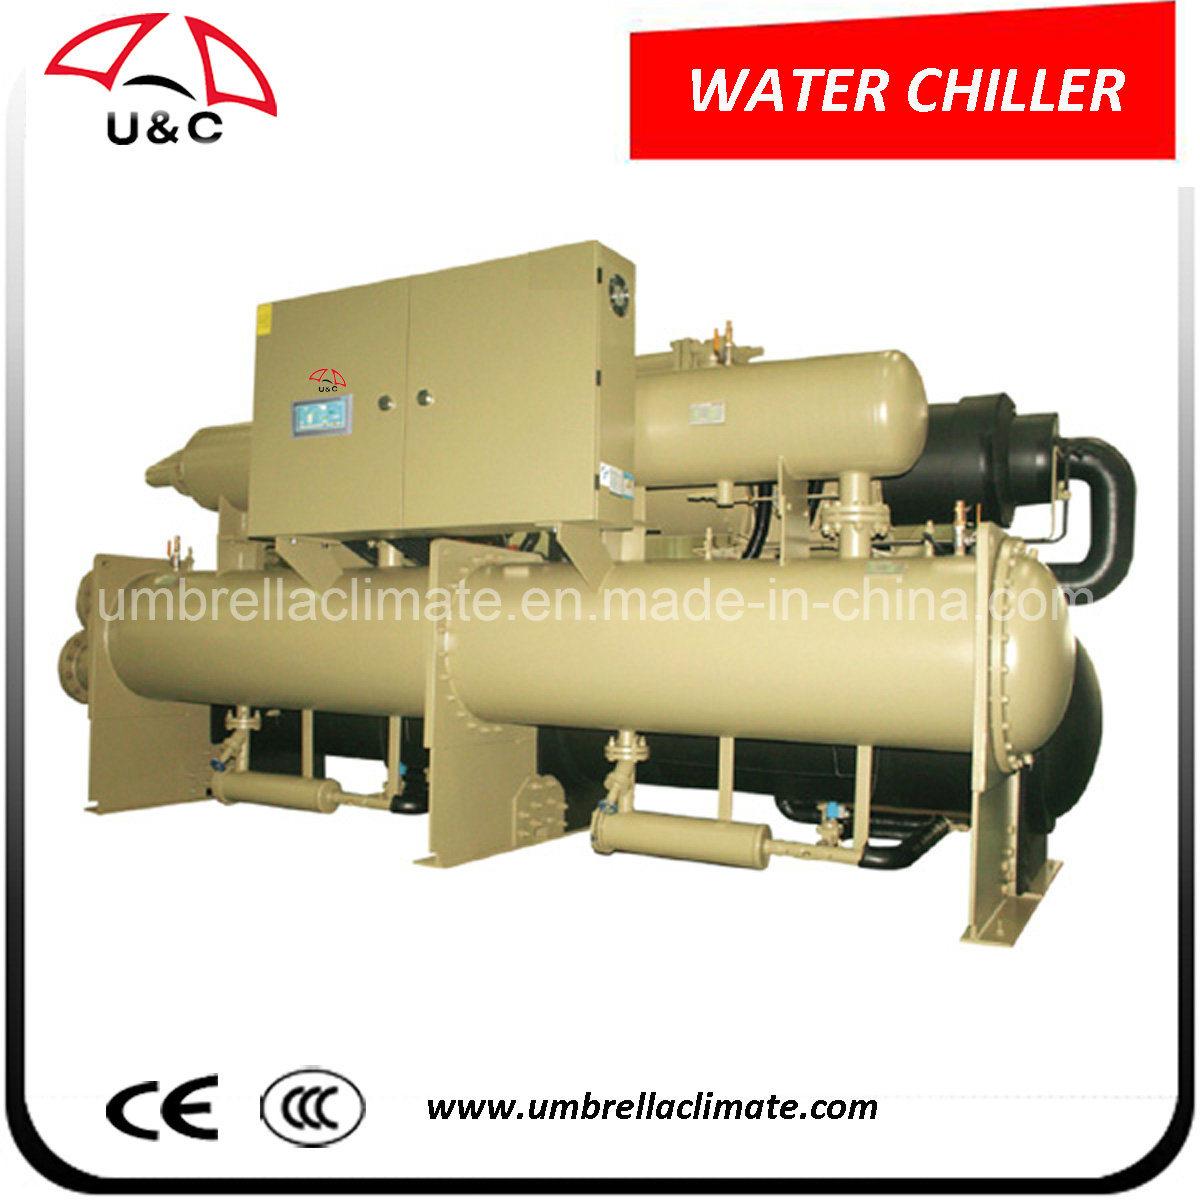 Pcwf Series Water Cooled Screw Chiller Water Chiller/ Heat Pump